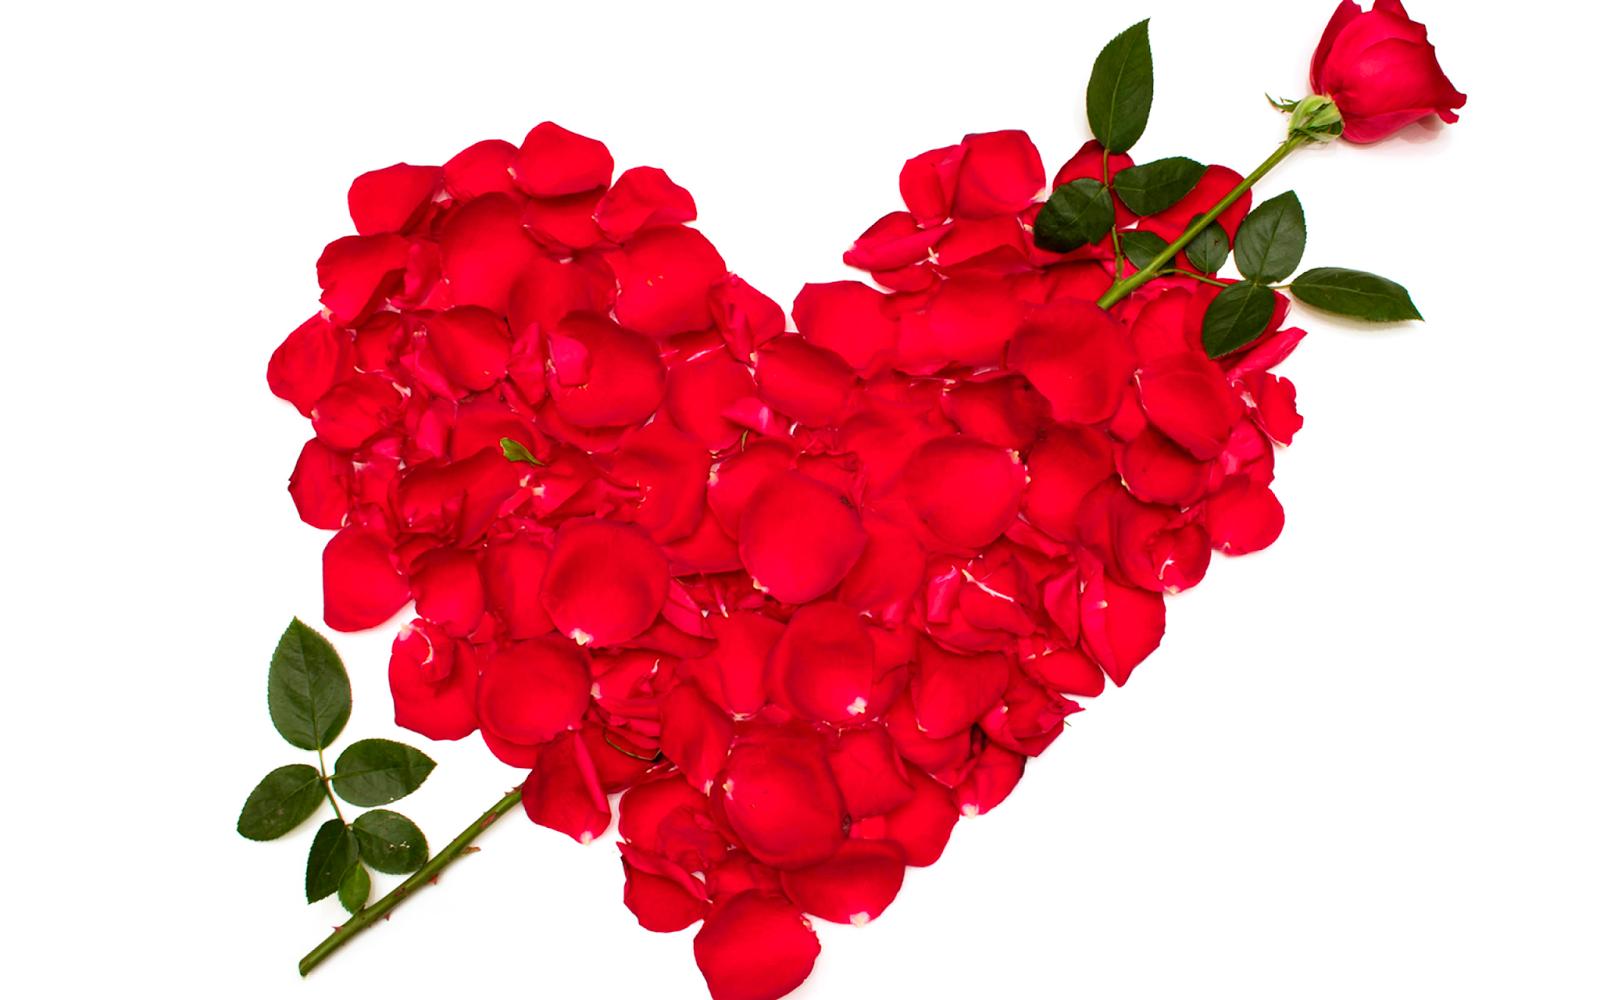 Fondos De Pantalla Animados De San Valentín: ® Gifs Y Fondos Paz Enla Tormenta ®: FONDOS DE PANTALLA